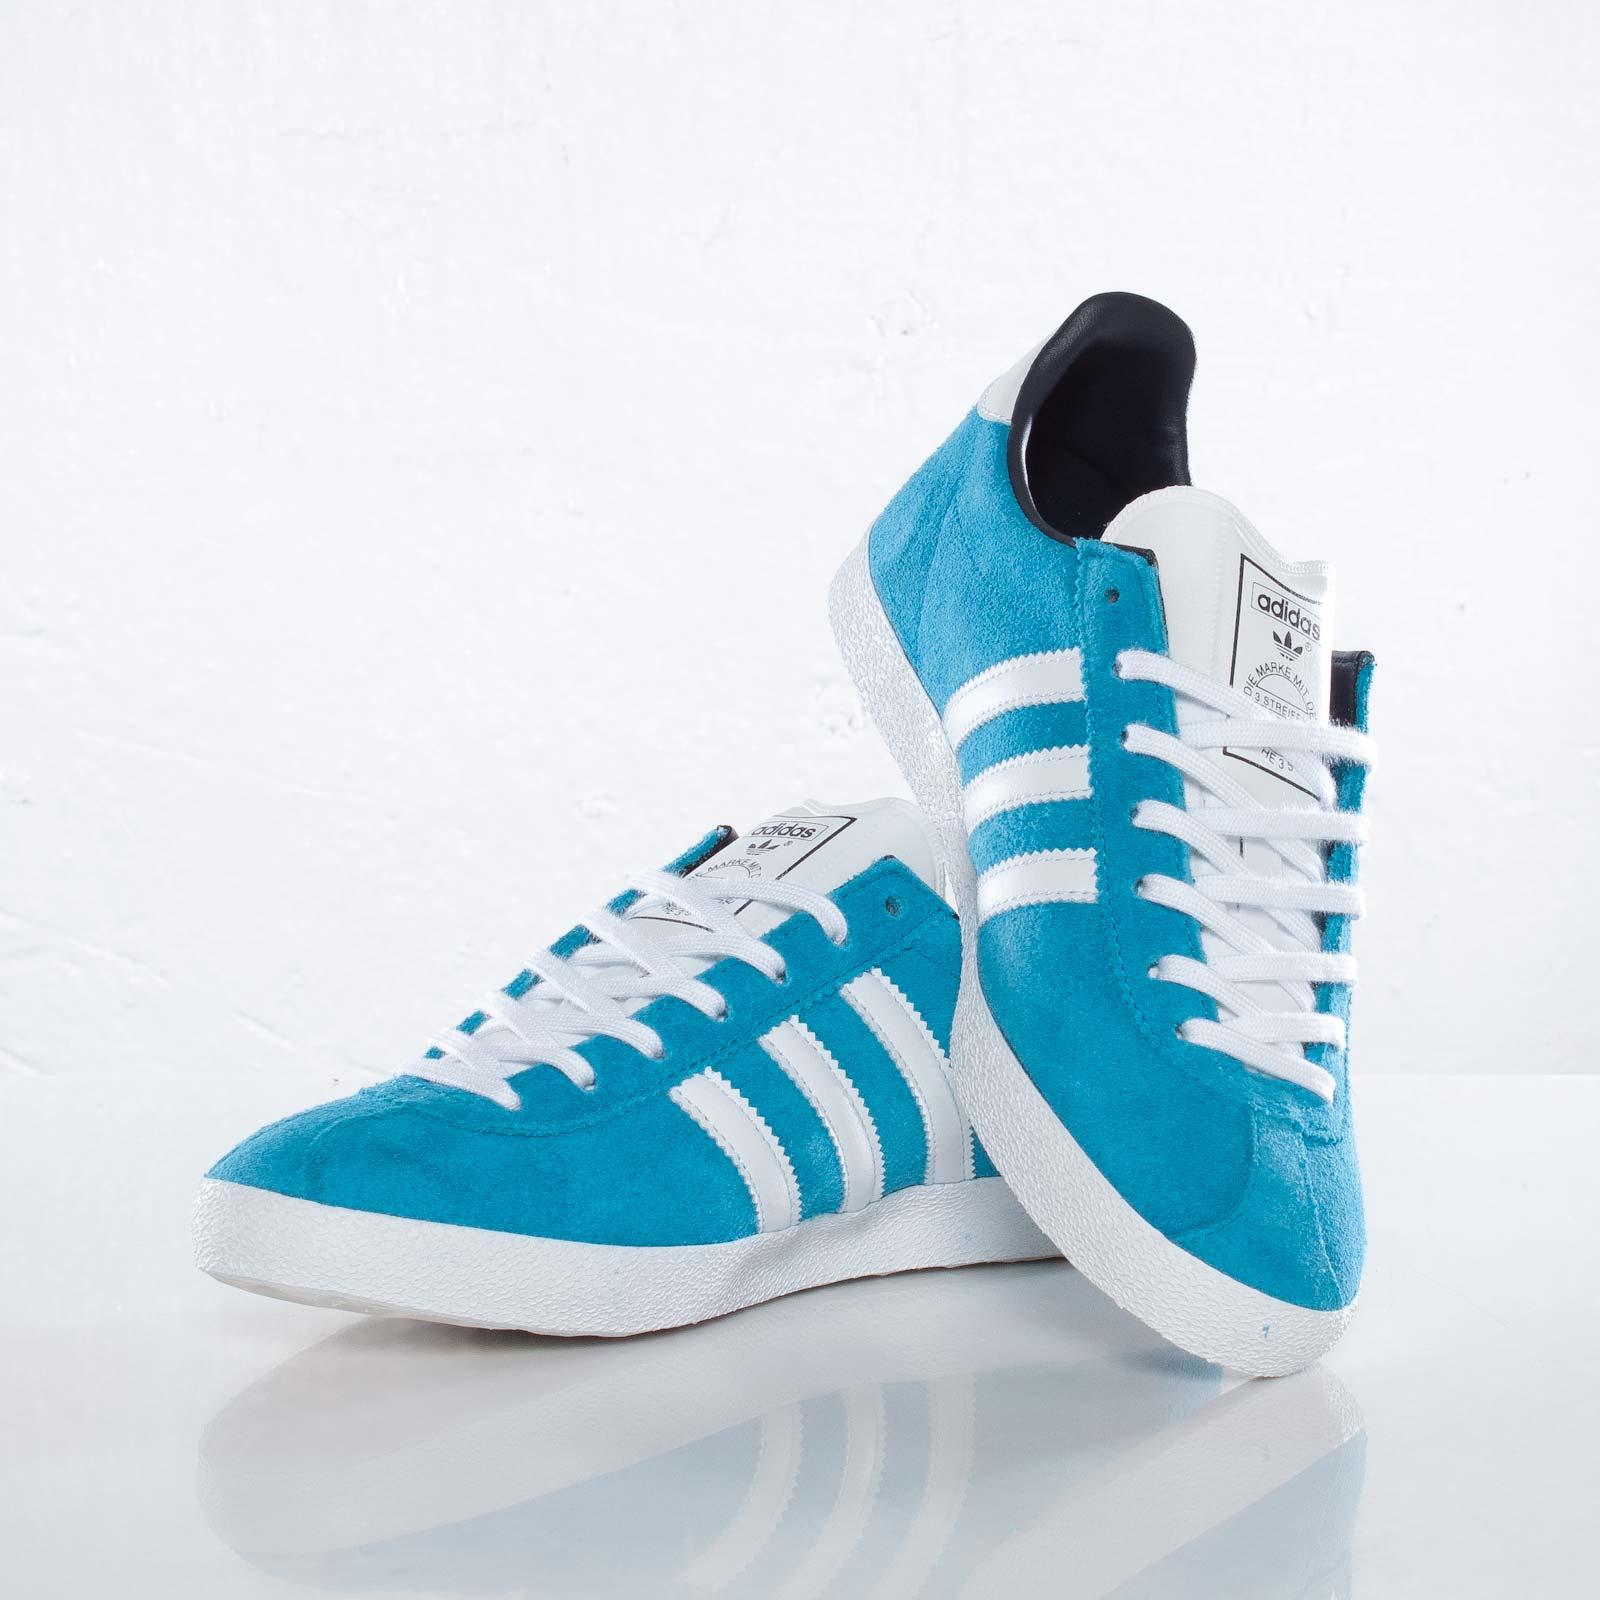 álbum de recortes encerrar sal  adidas Gazelle OG W - Q20700 - Sneakersnstuff | sneakers & streetwear  online since 1999